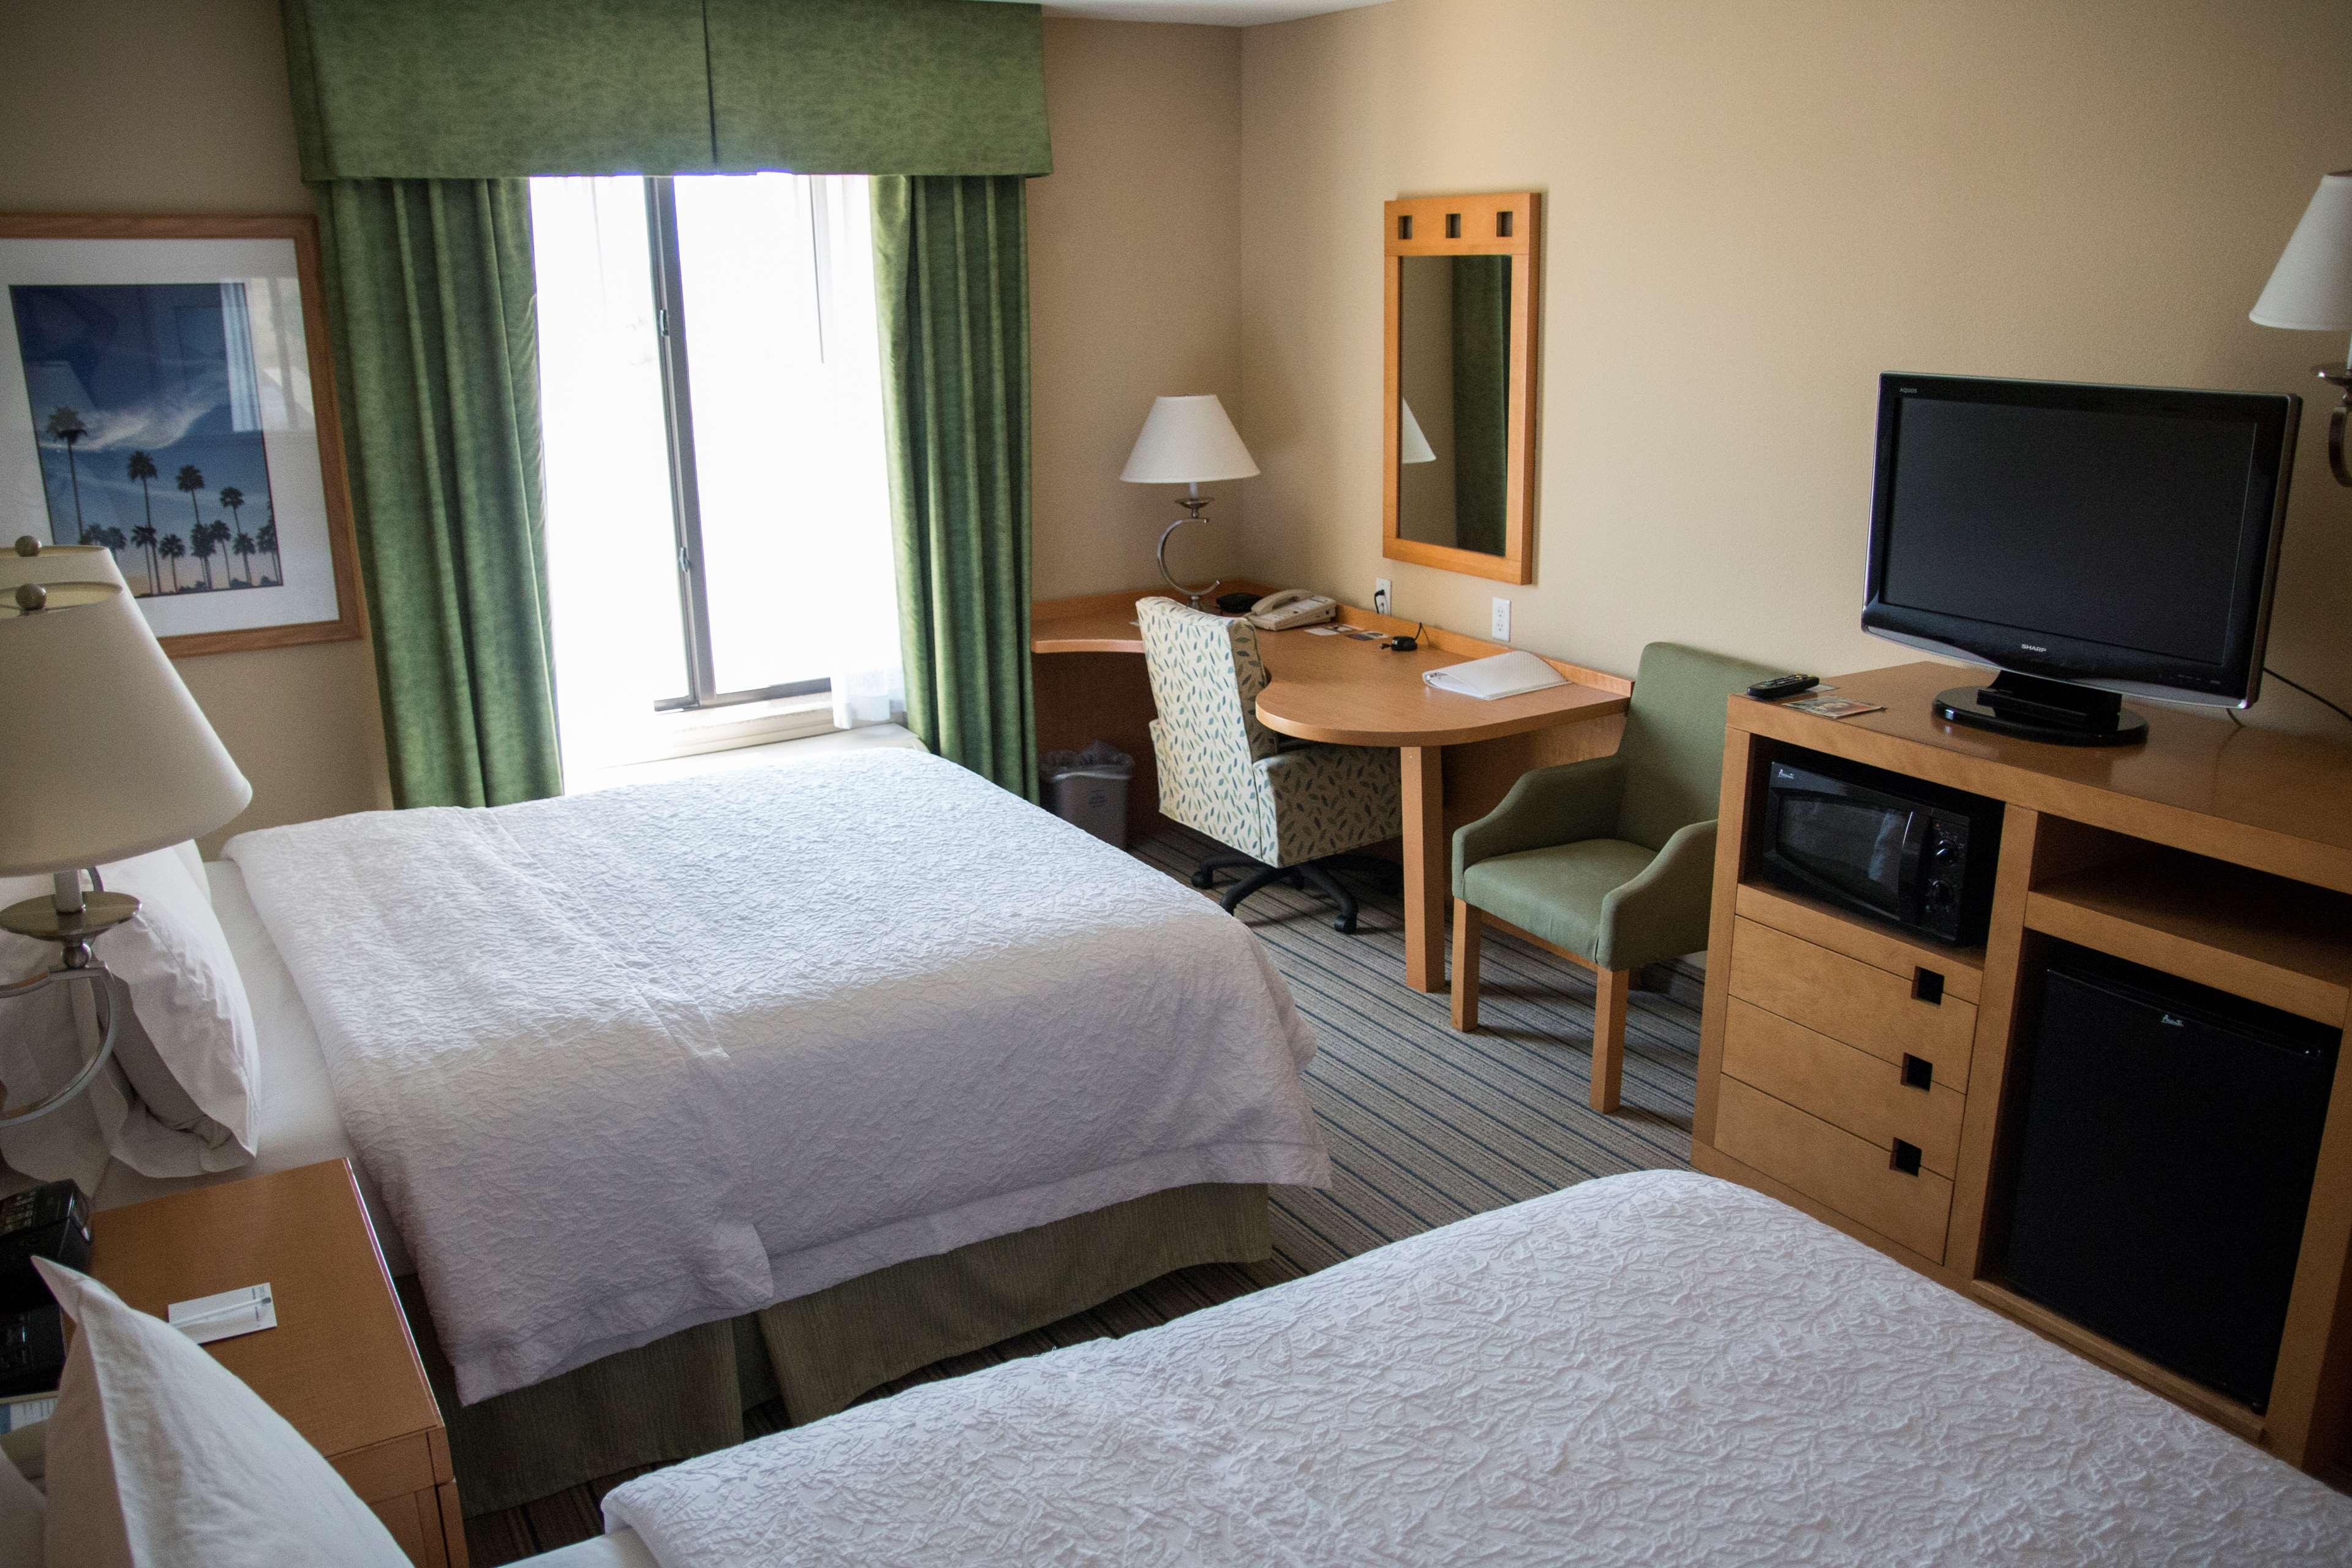 Hampton Inn & Suites Madera image 24